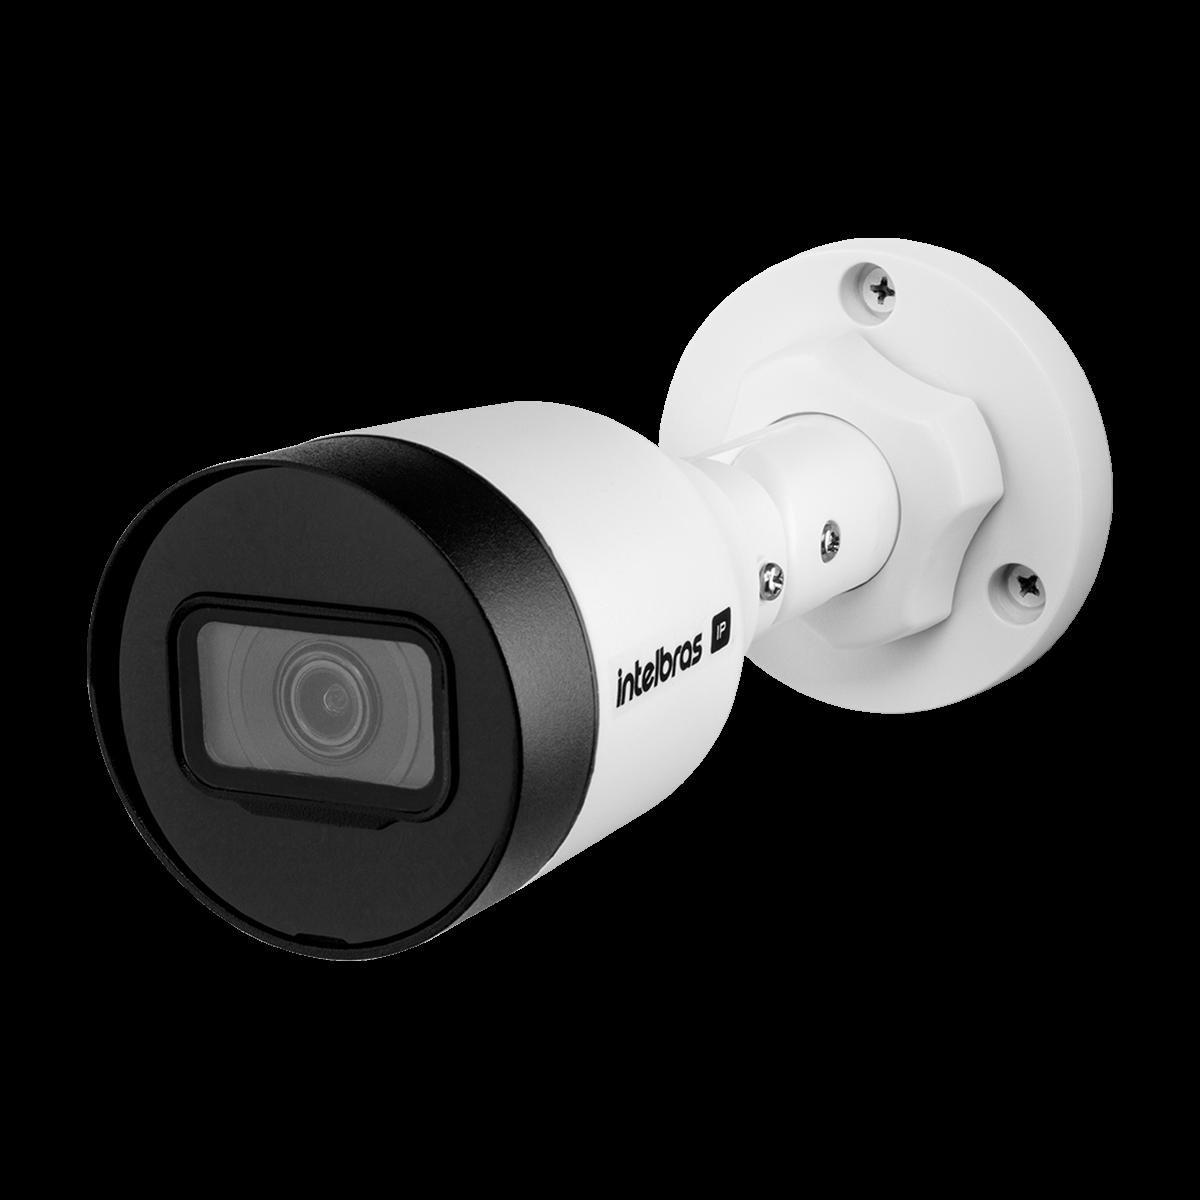 Câmera Intelbras Bullet VIP 1230 B (2MP | 1080p | 3.6mm | Plast)  - CFTV Clube | Brasil